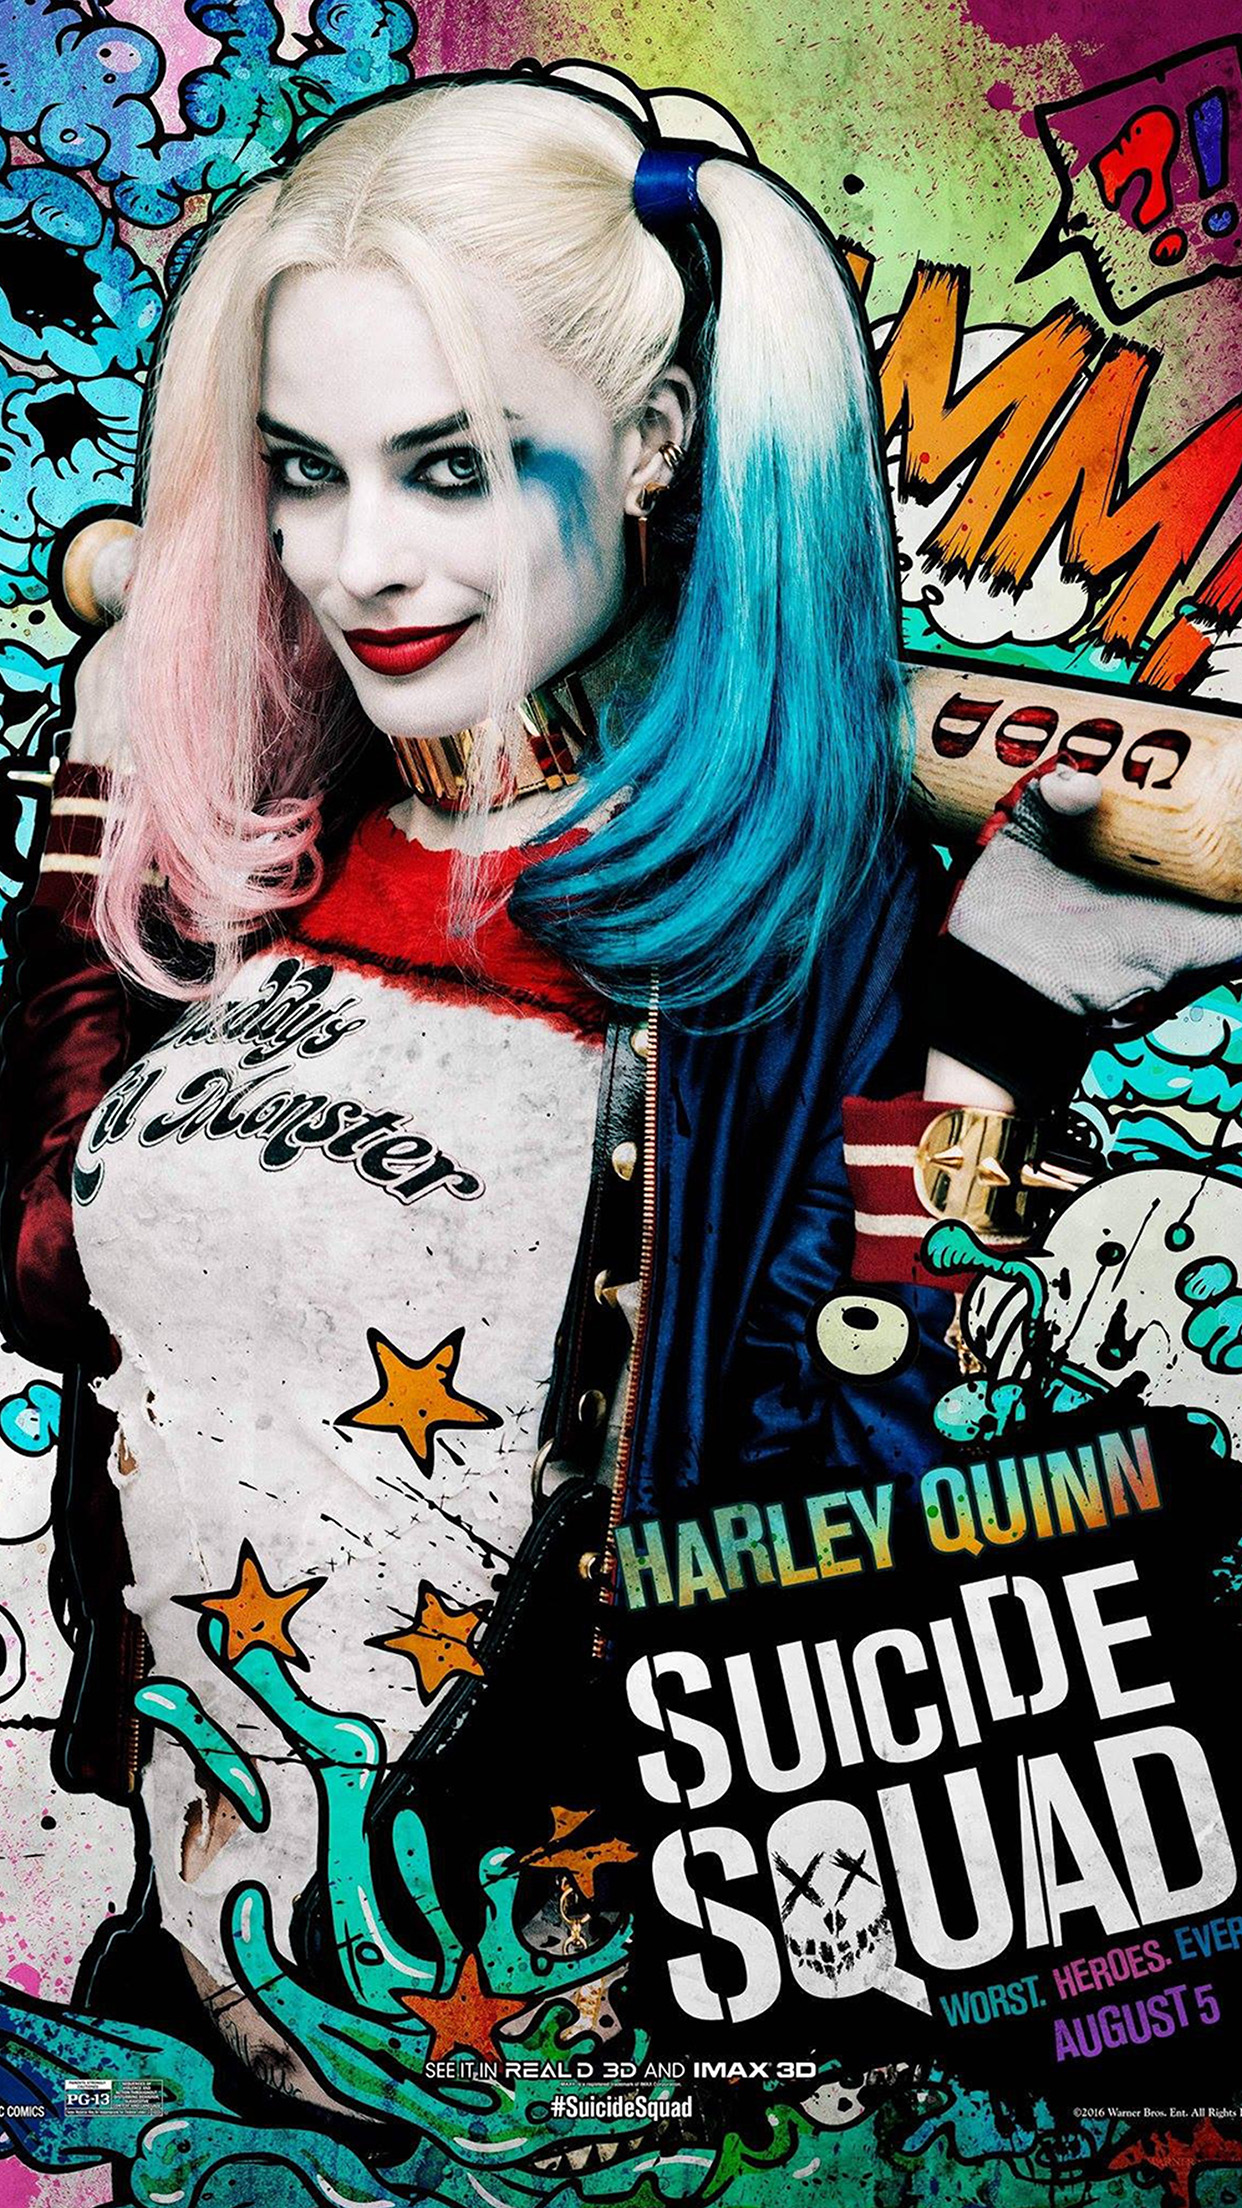 Suicide Squad Film Poster Art Illustration Joker Haley Quinn Android